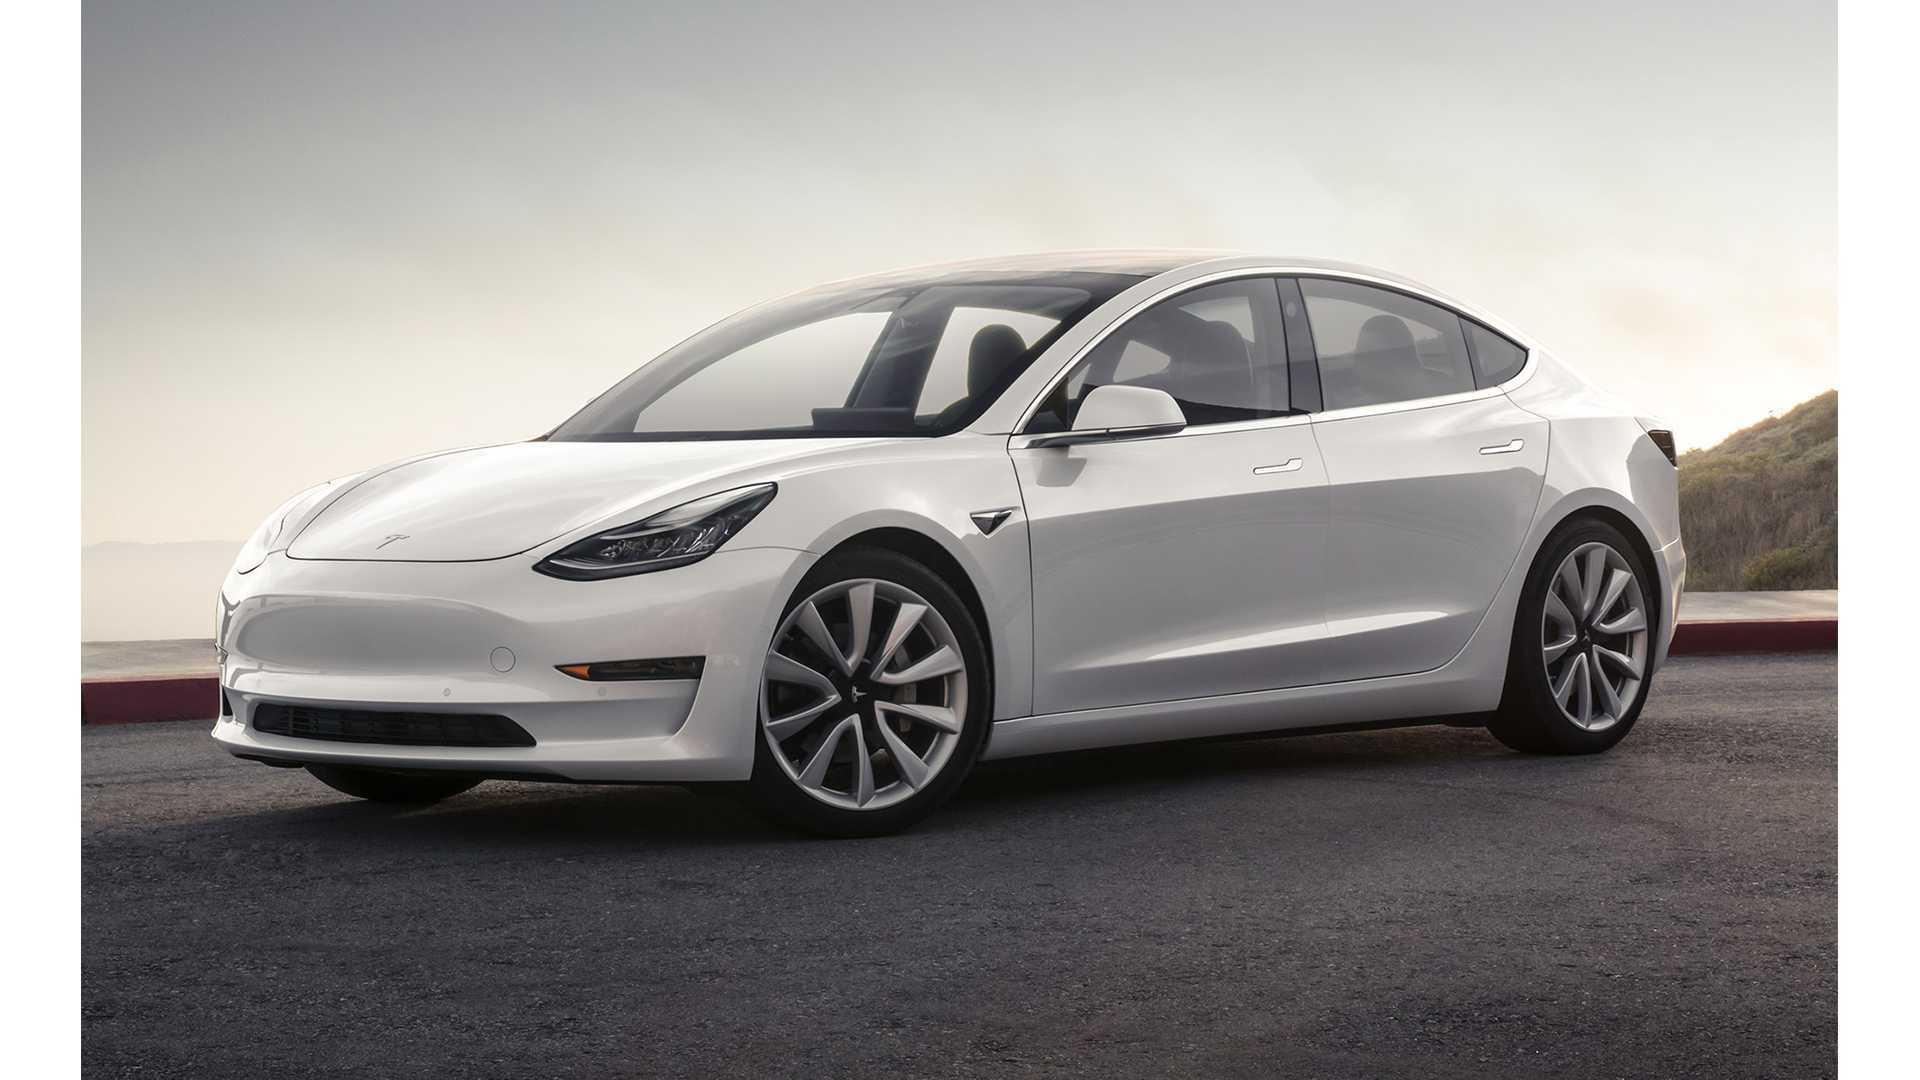 Tesla Model 3 Tops Audi E-Tron & Jaguar I-Pace In UK